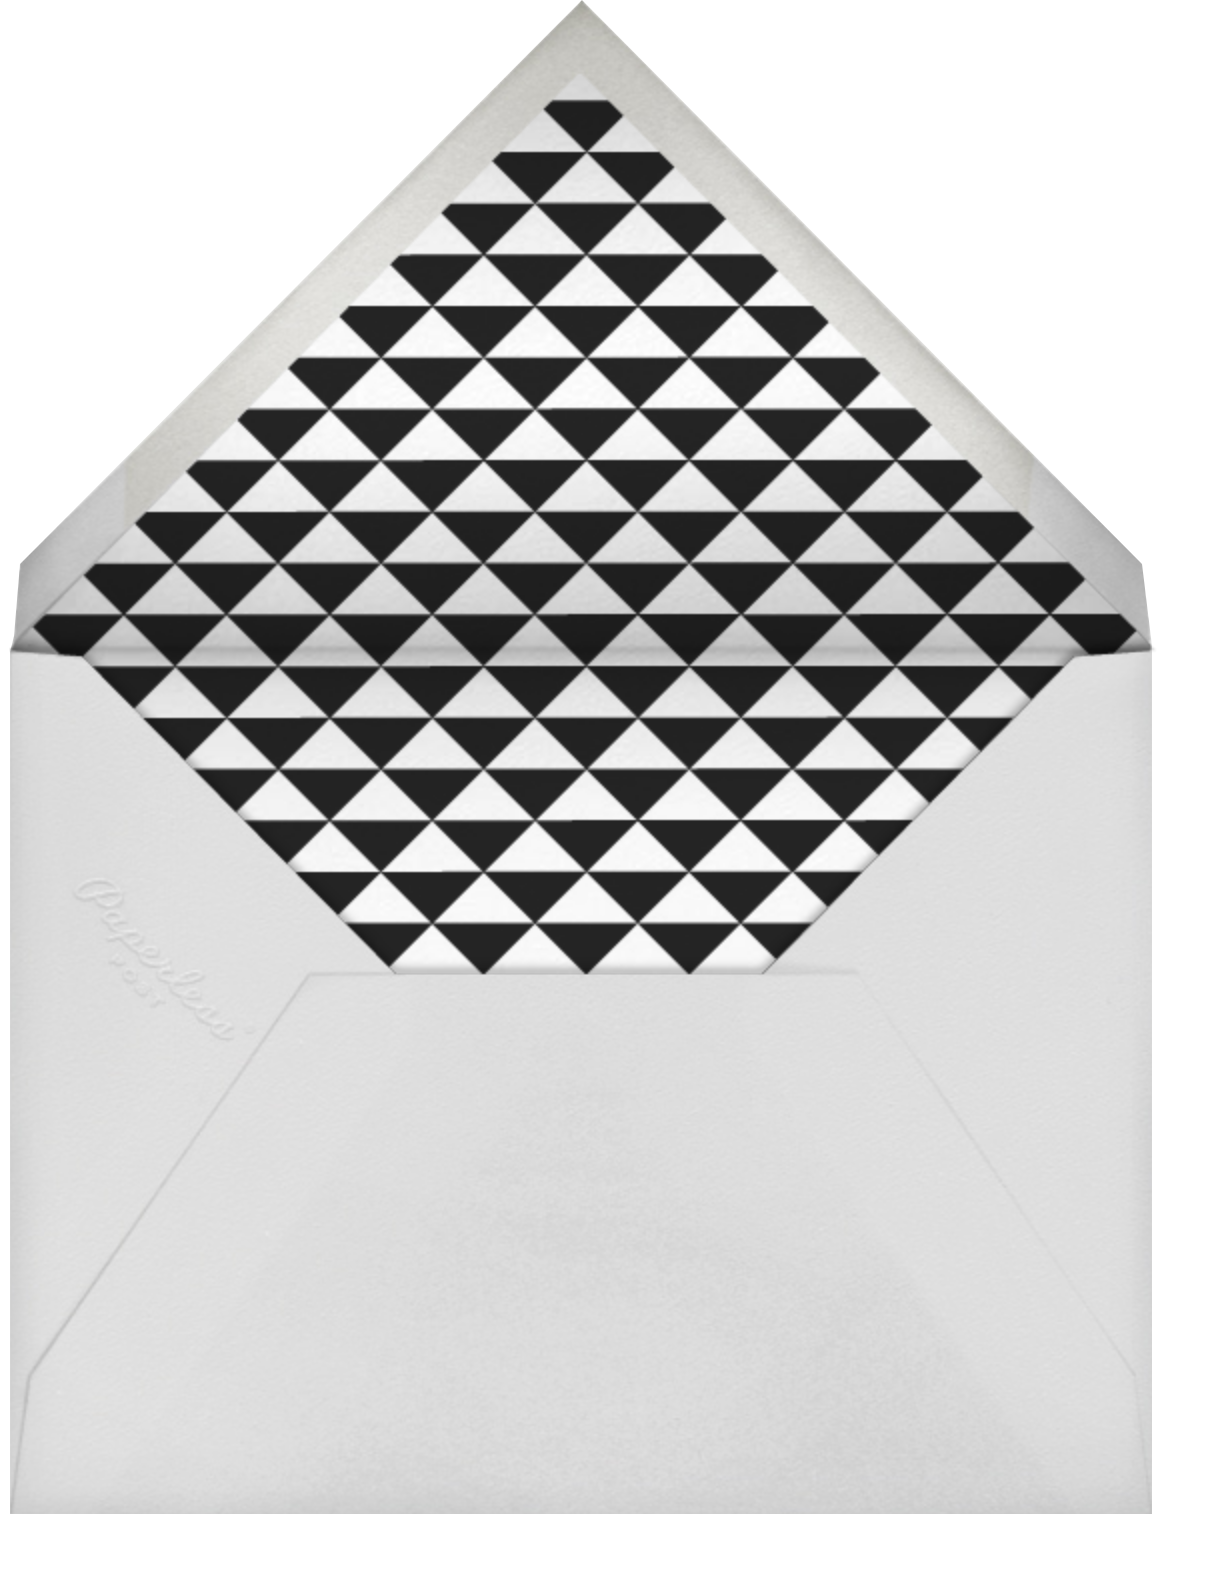 Jolly Good Photo (Him) - Paperless Post - Adult birthday - envelope back